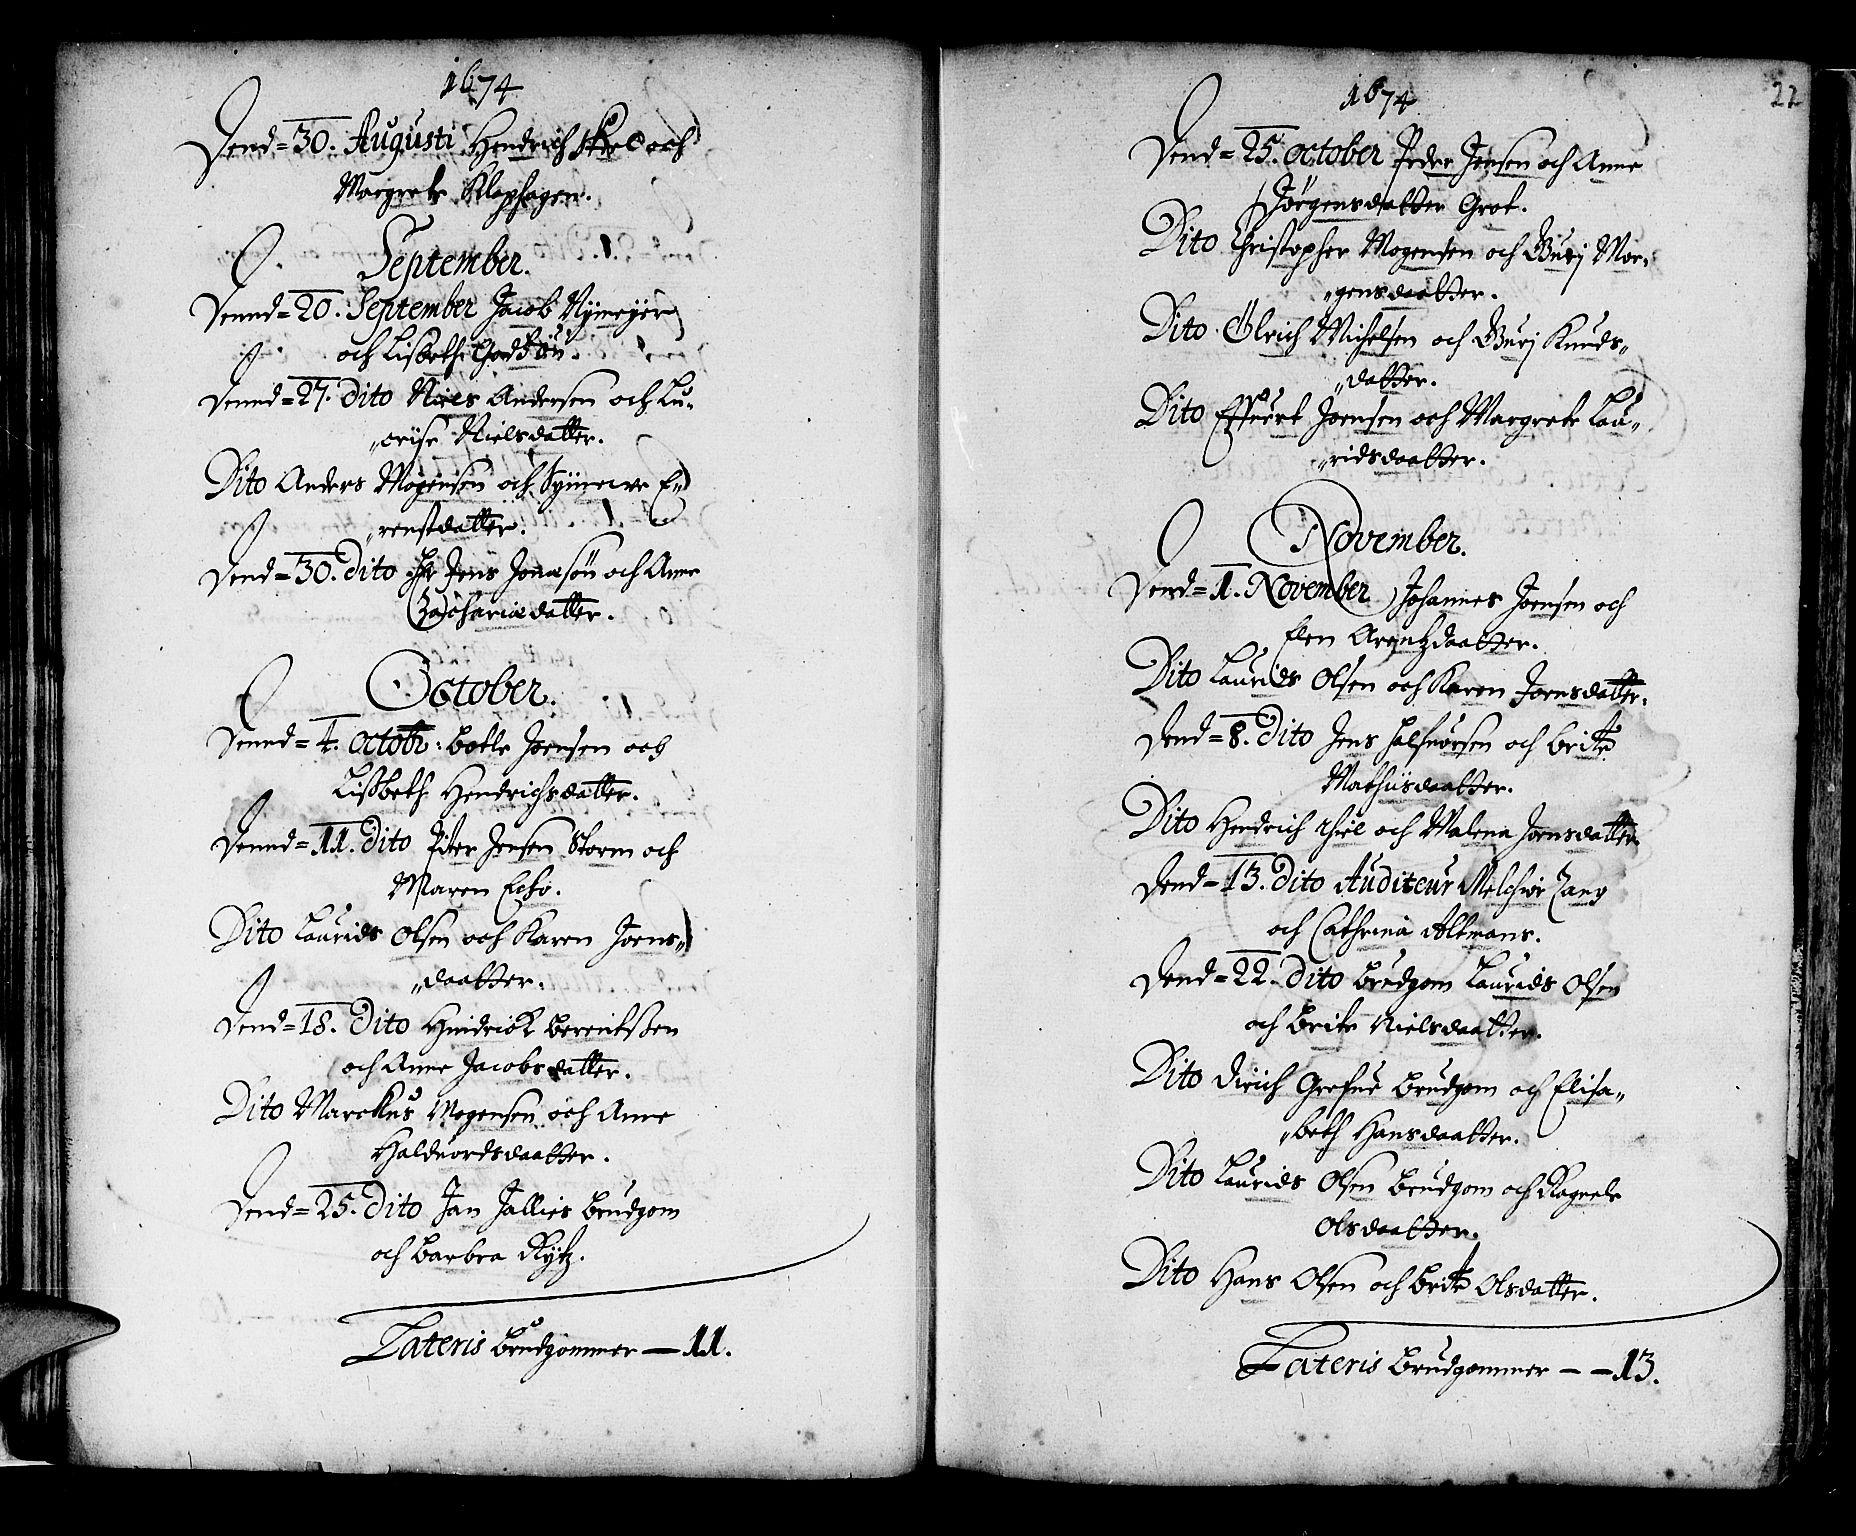 SAB, Korskirken Sokneprestembete, H/Haa/L0001: Ministerialbok nr. A 1, 1674-1688, s. 22